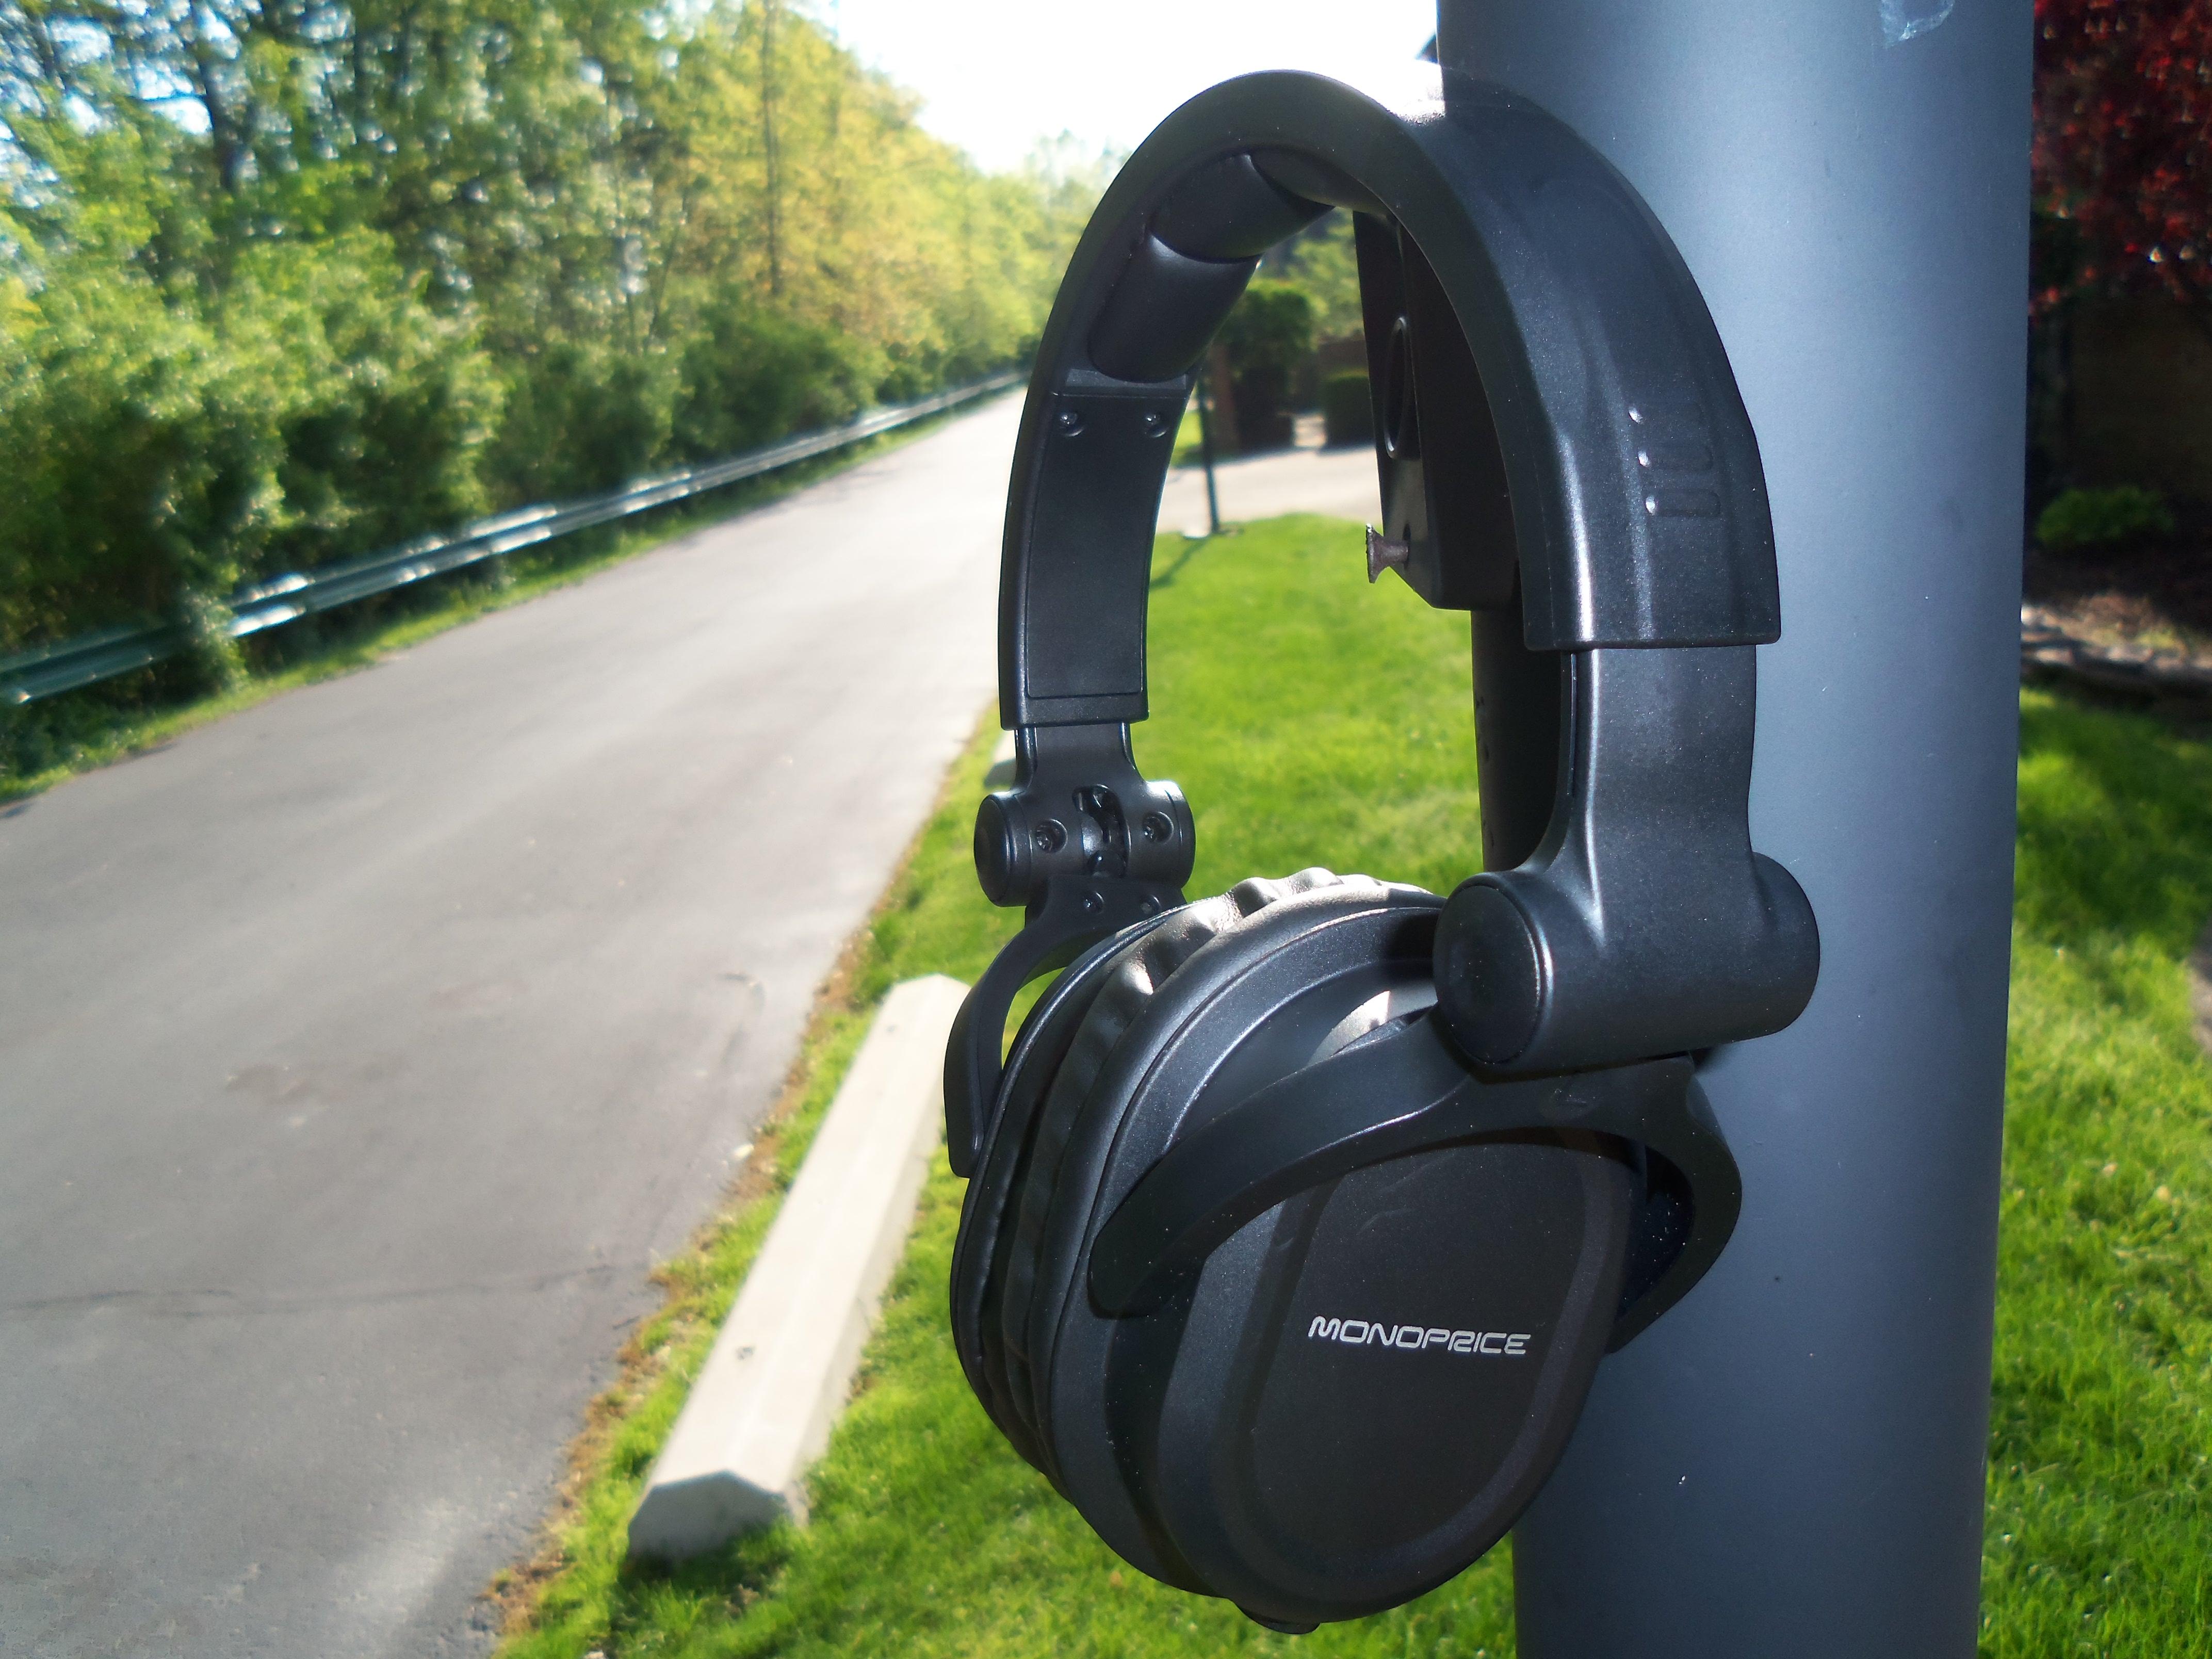 3200d8d5382 MonoPrice DJ Headphones 8323 Review *** | Headphone Reviews and ...